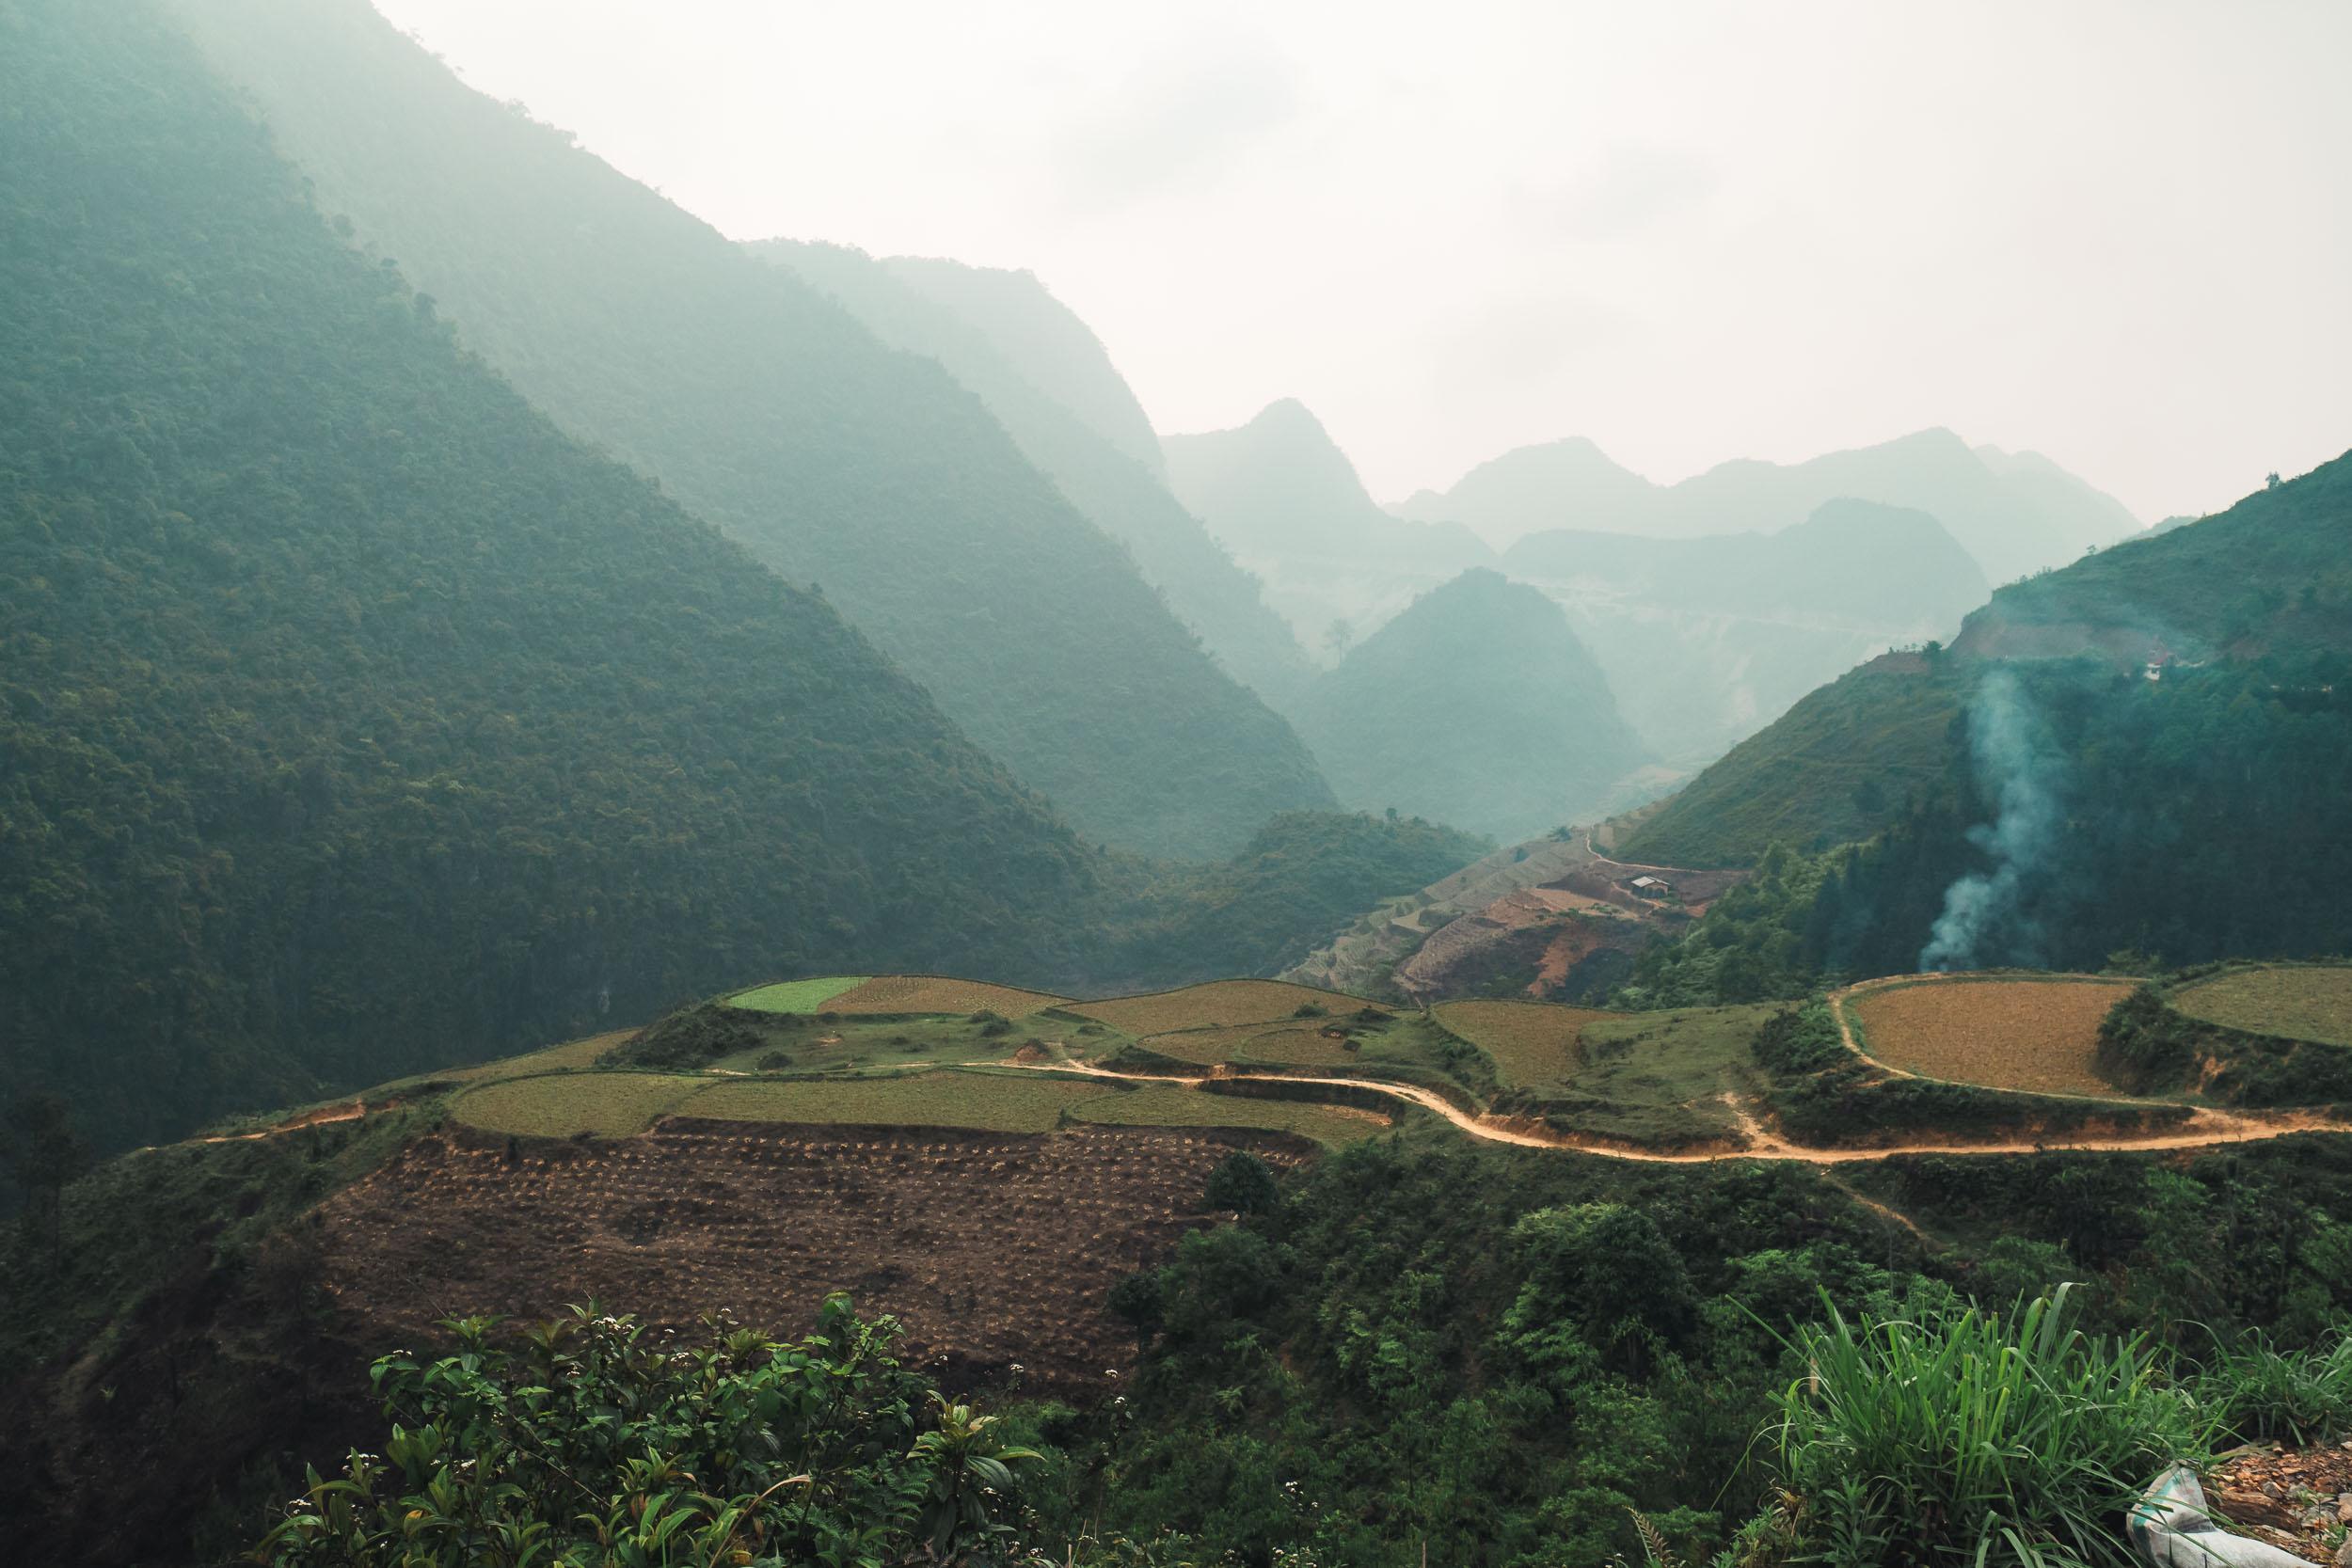 ha_giang_rice_terrace.jpg